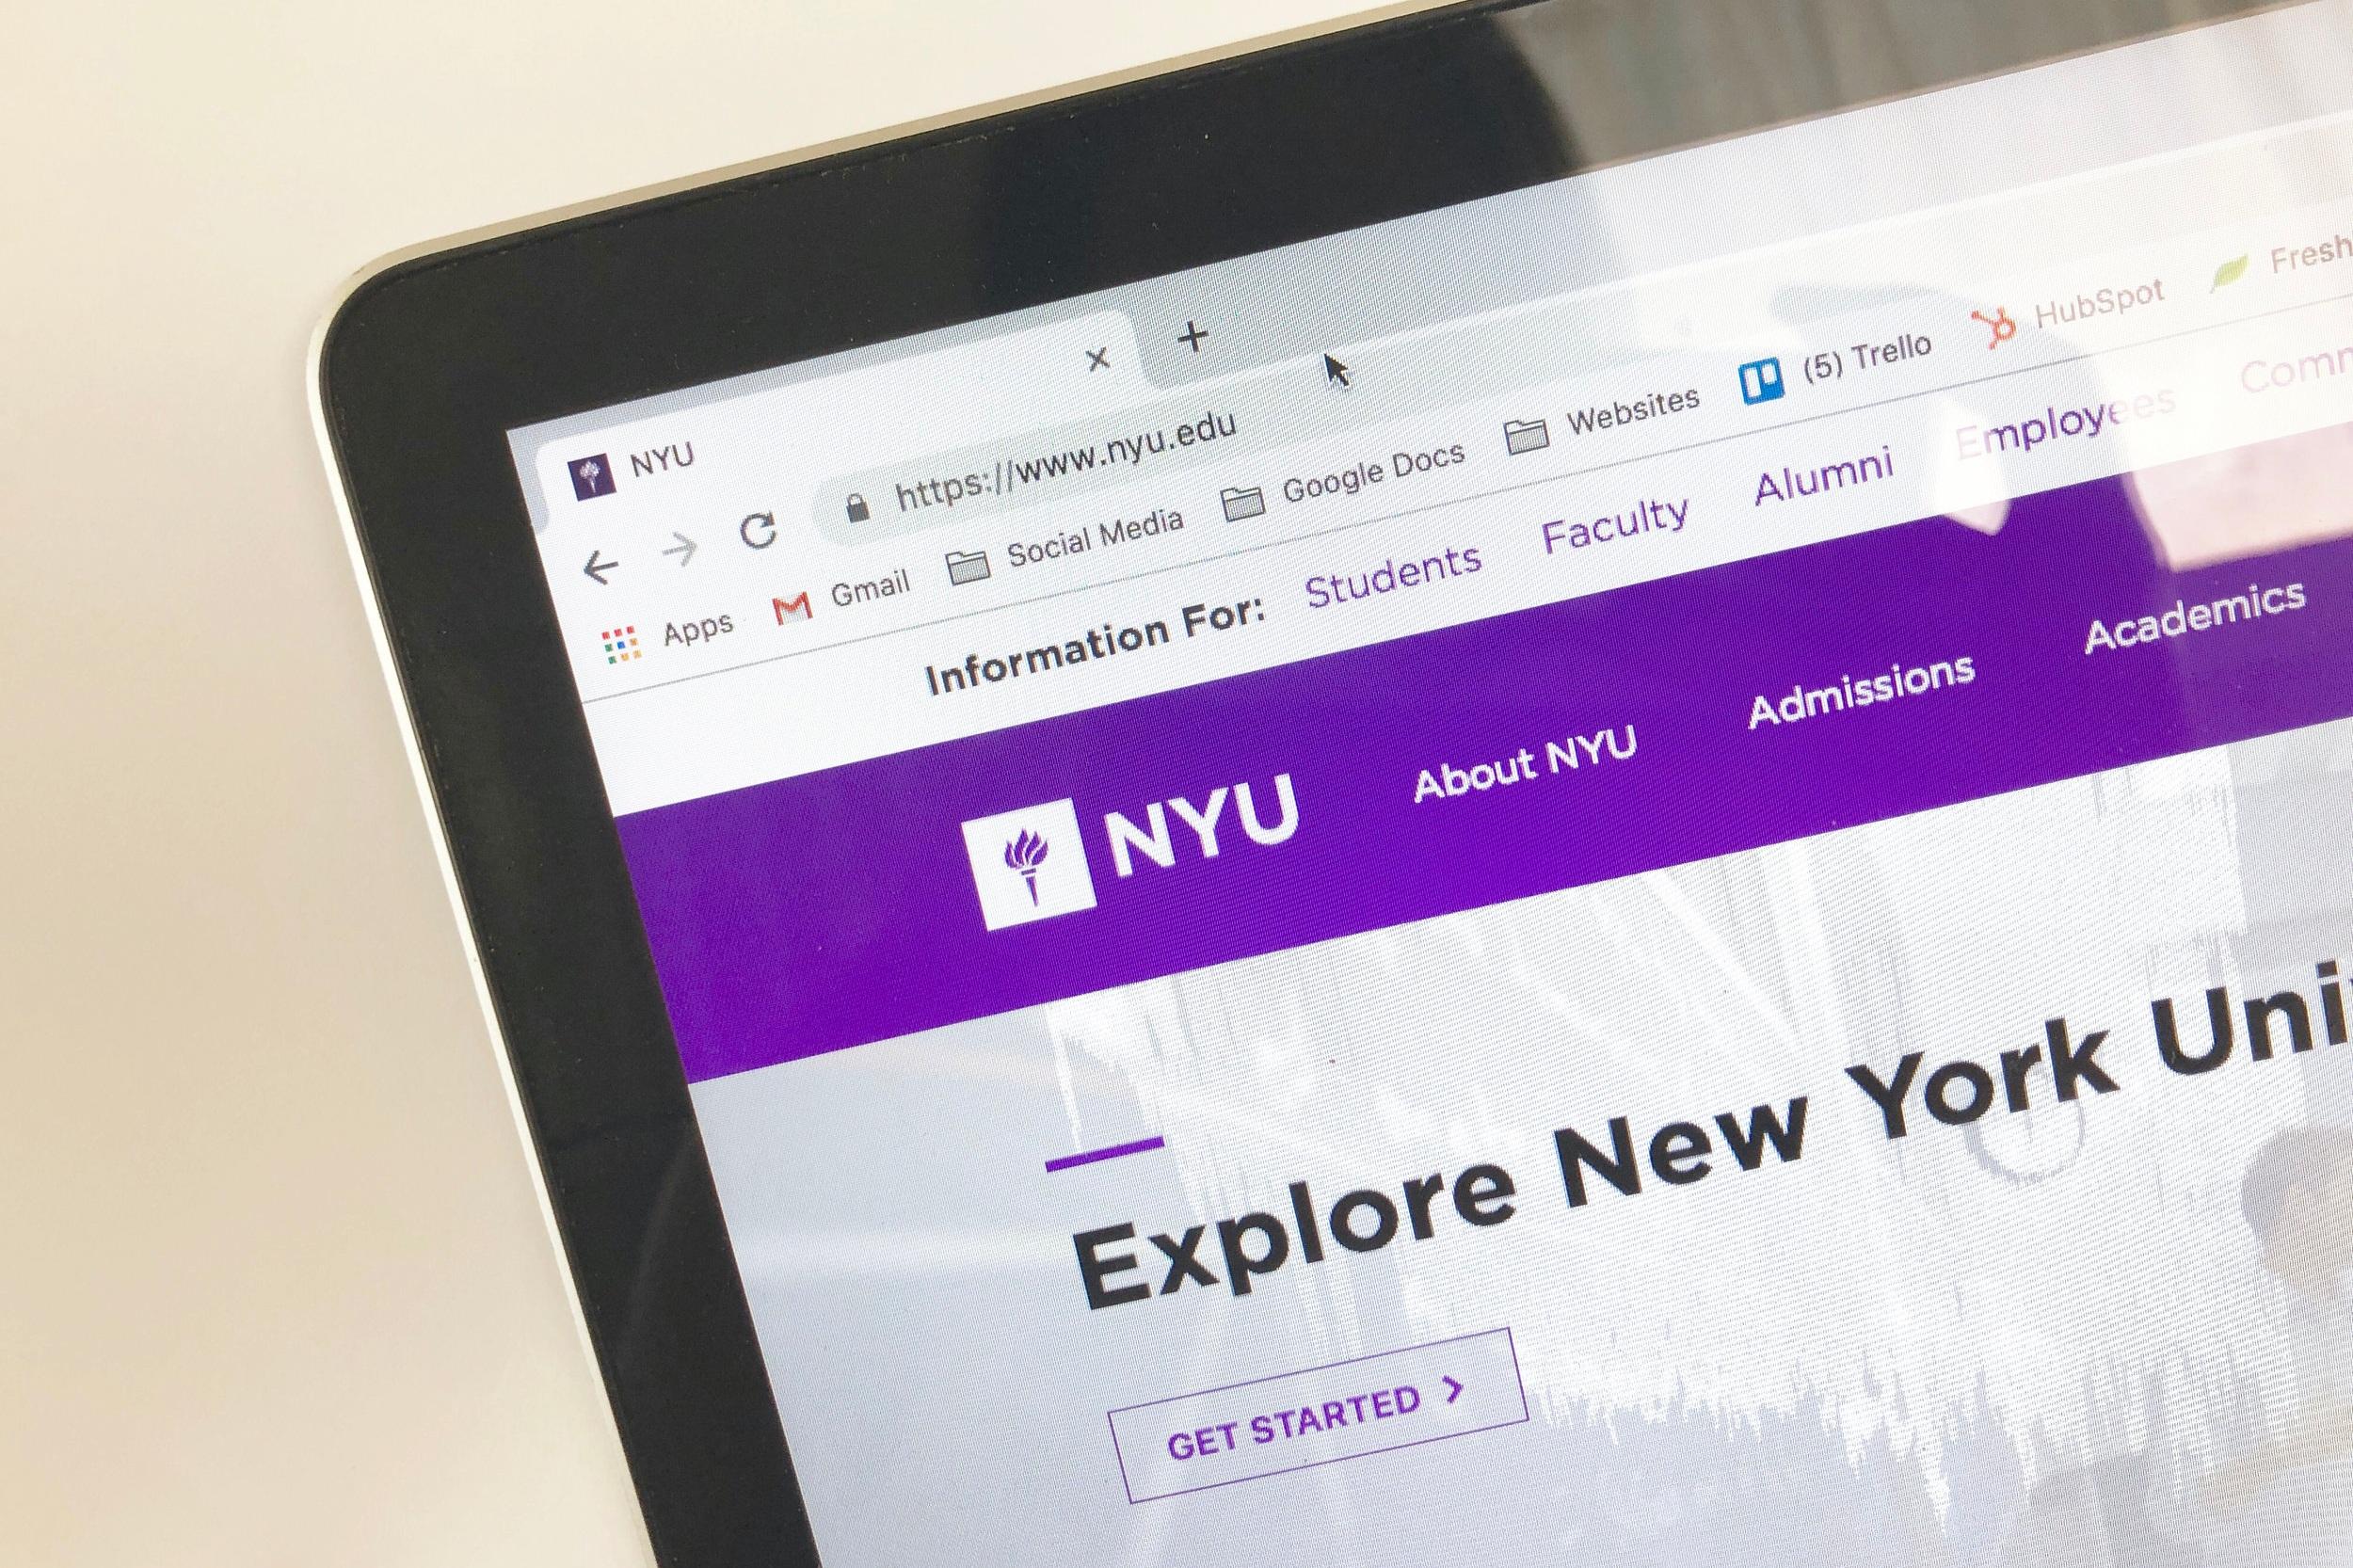 How to Answer NYU Long Island School of Medicine's New